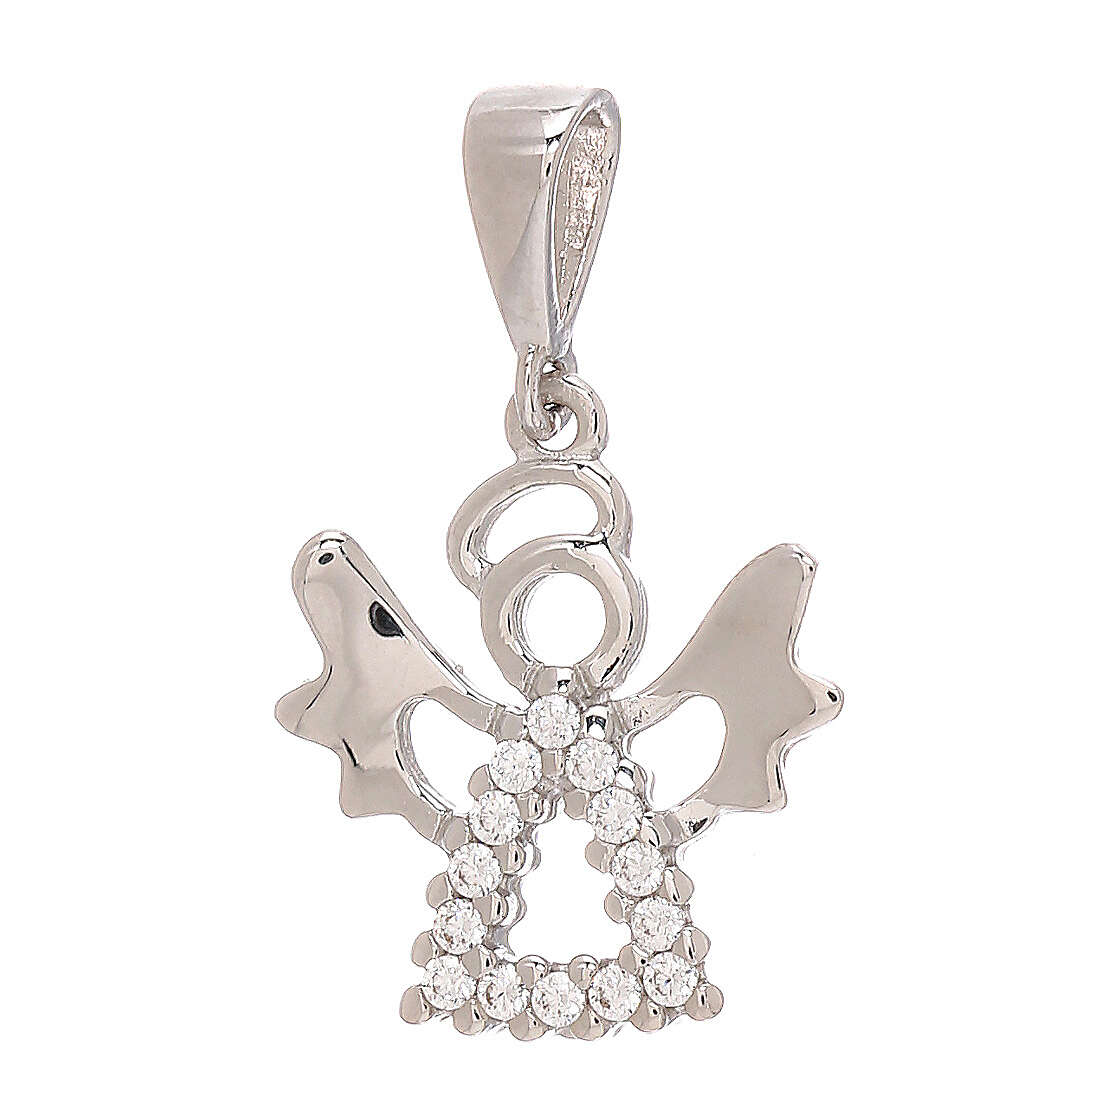 Colgante angelito Swarovski oro blanco 18 k perforado 4